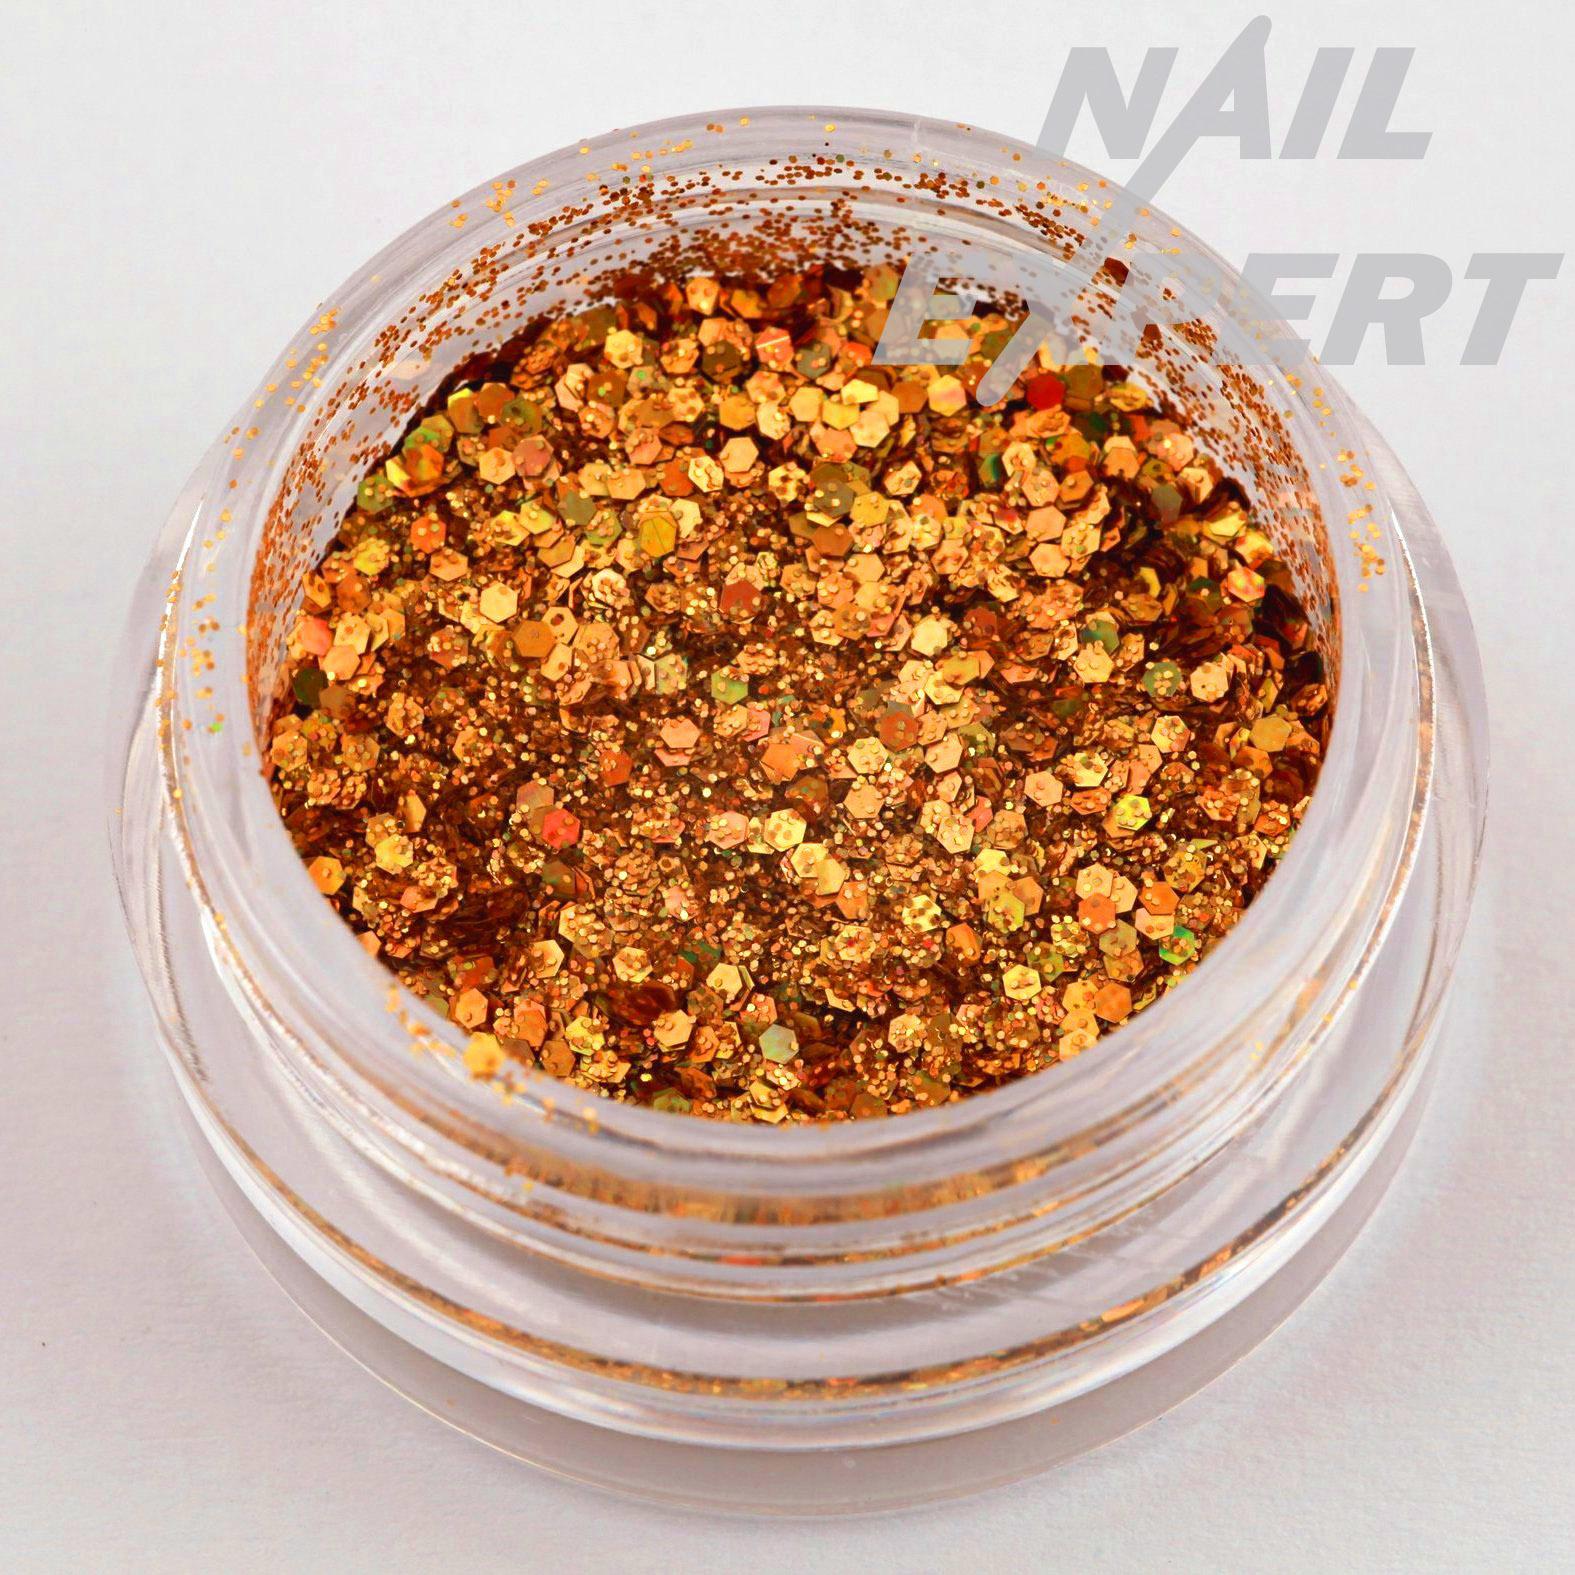 Nail Expert Sparkling glitter 1004